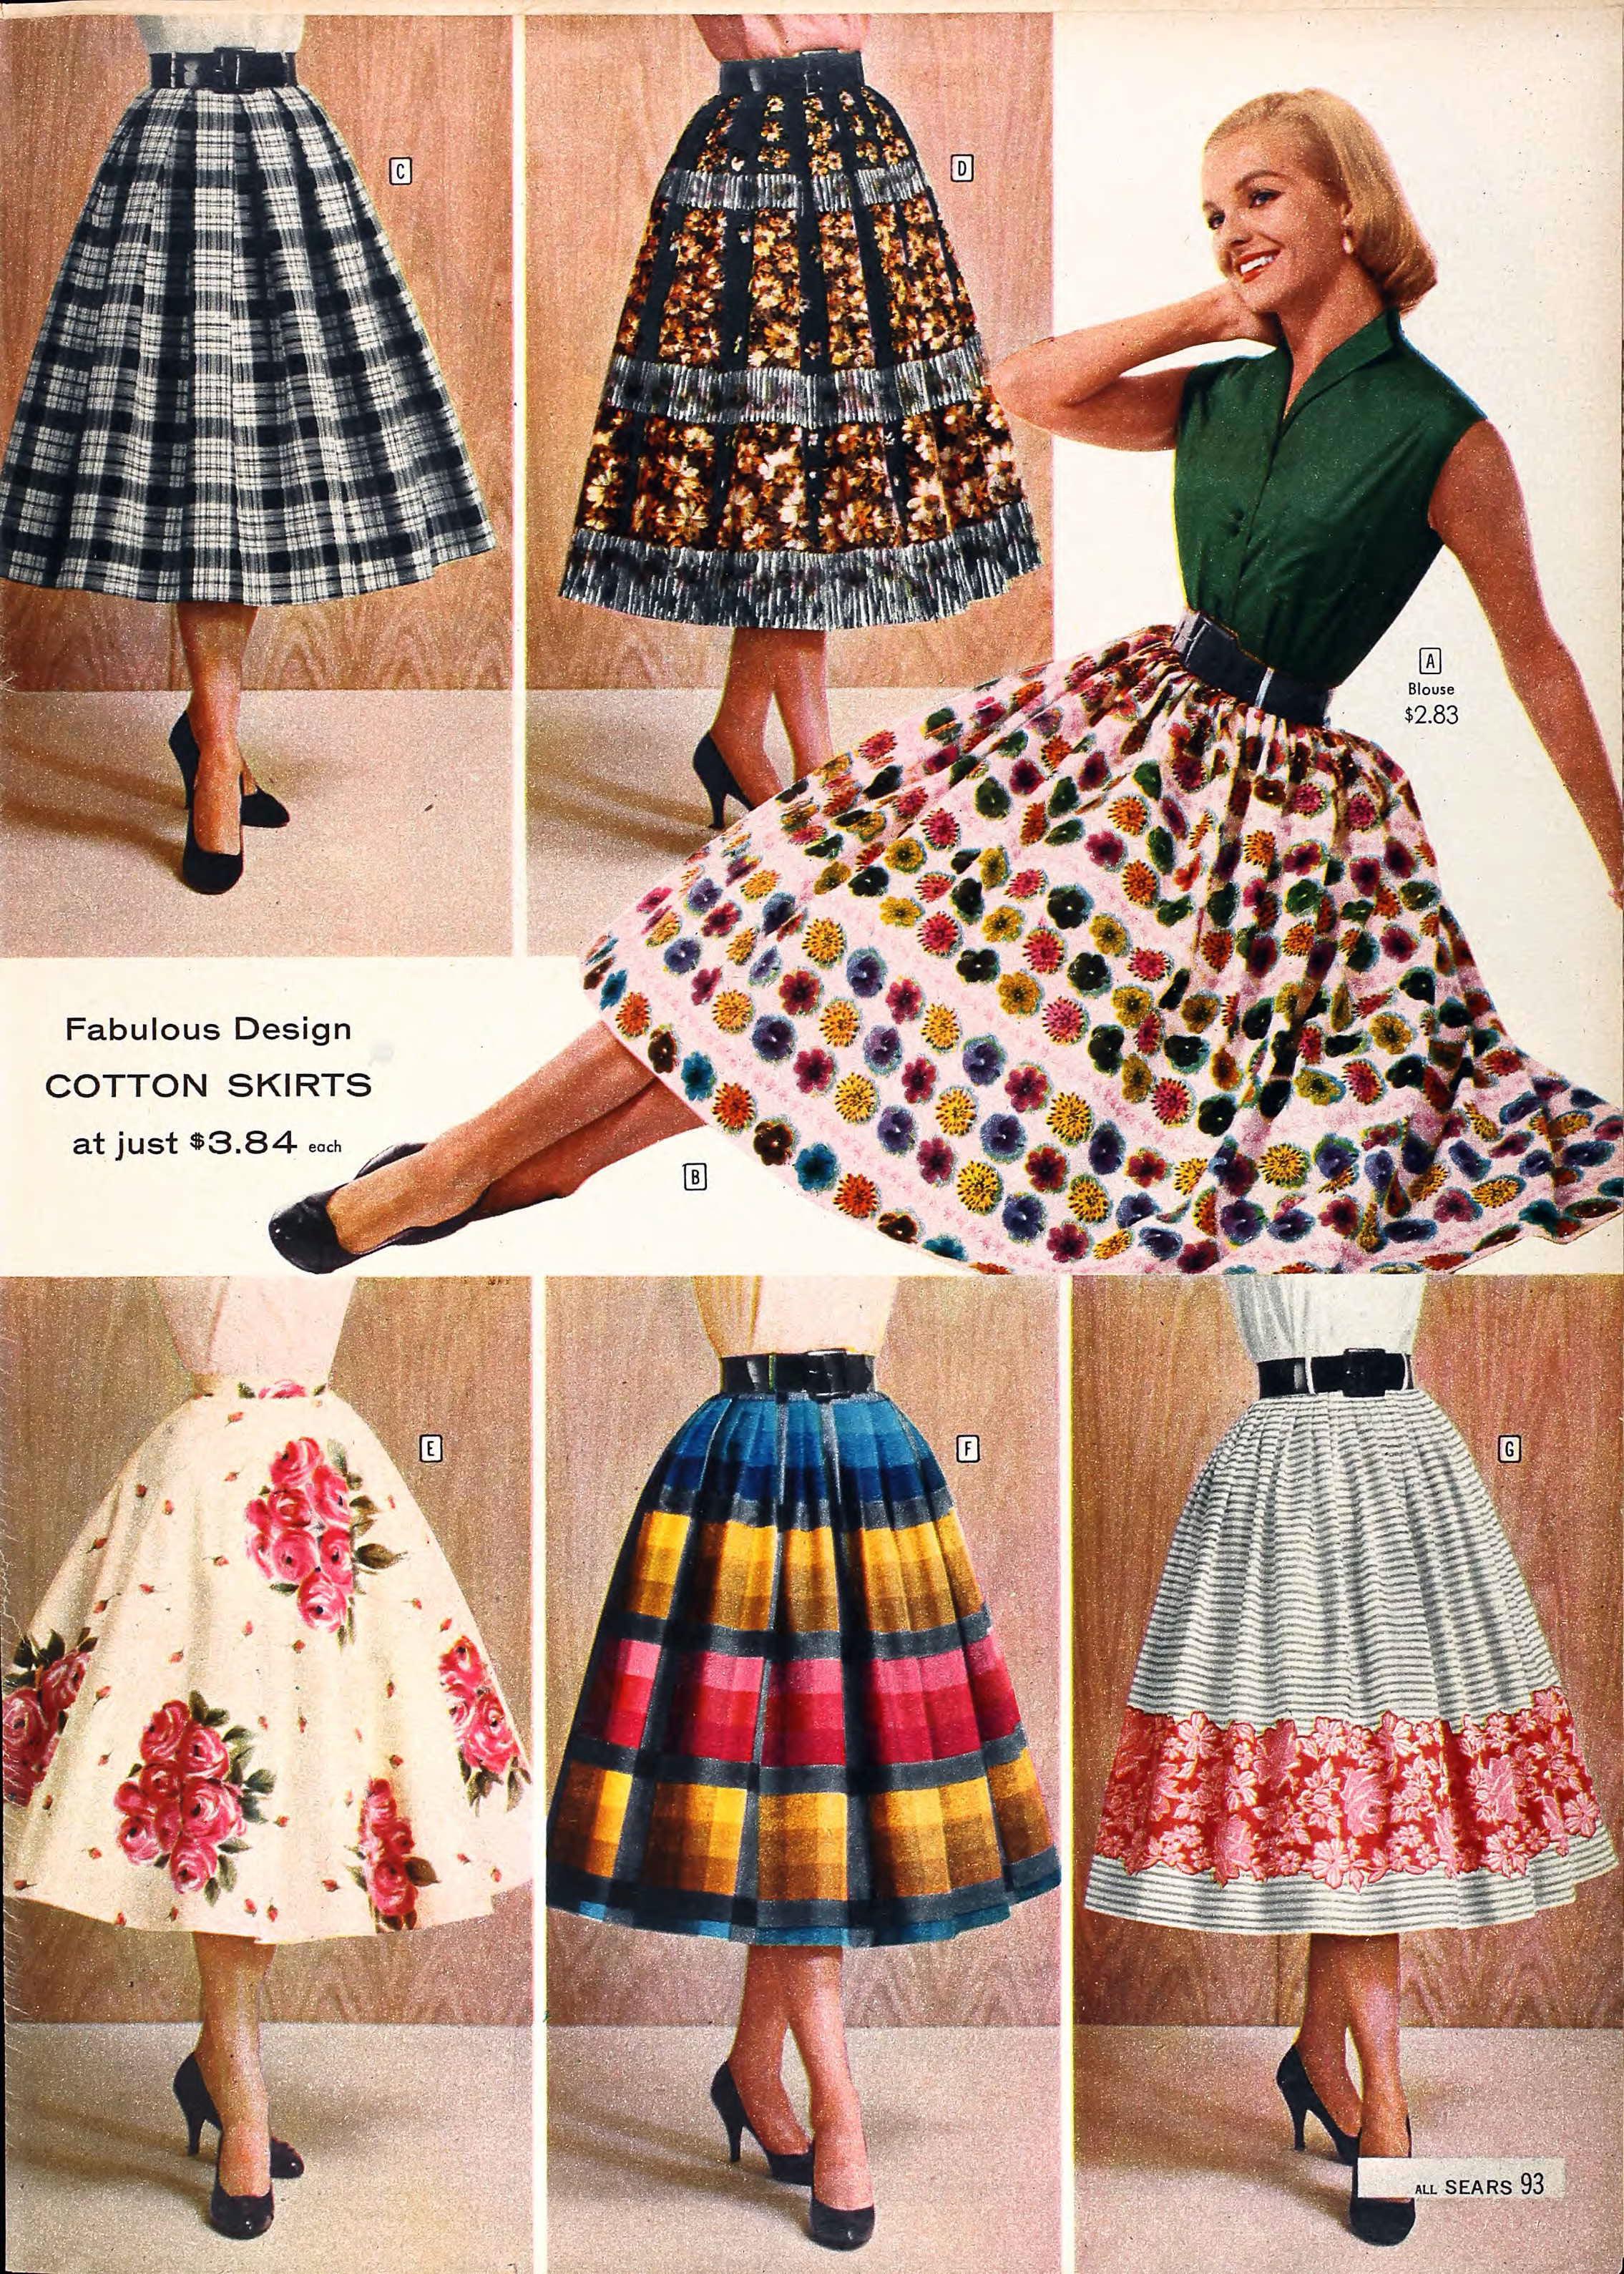 Sears Catalog Highlights: Spring/Summer 1958   grayflannelsuit.net